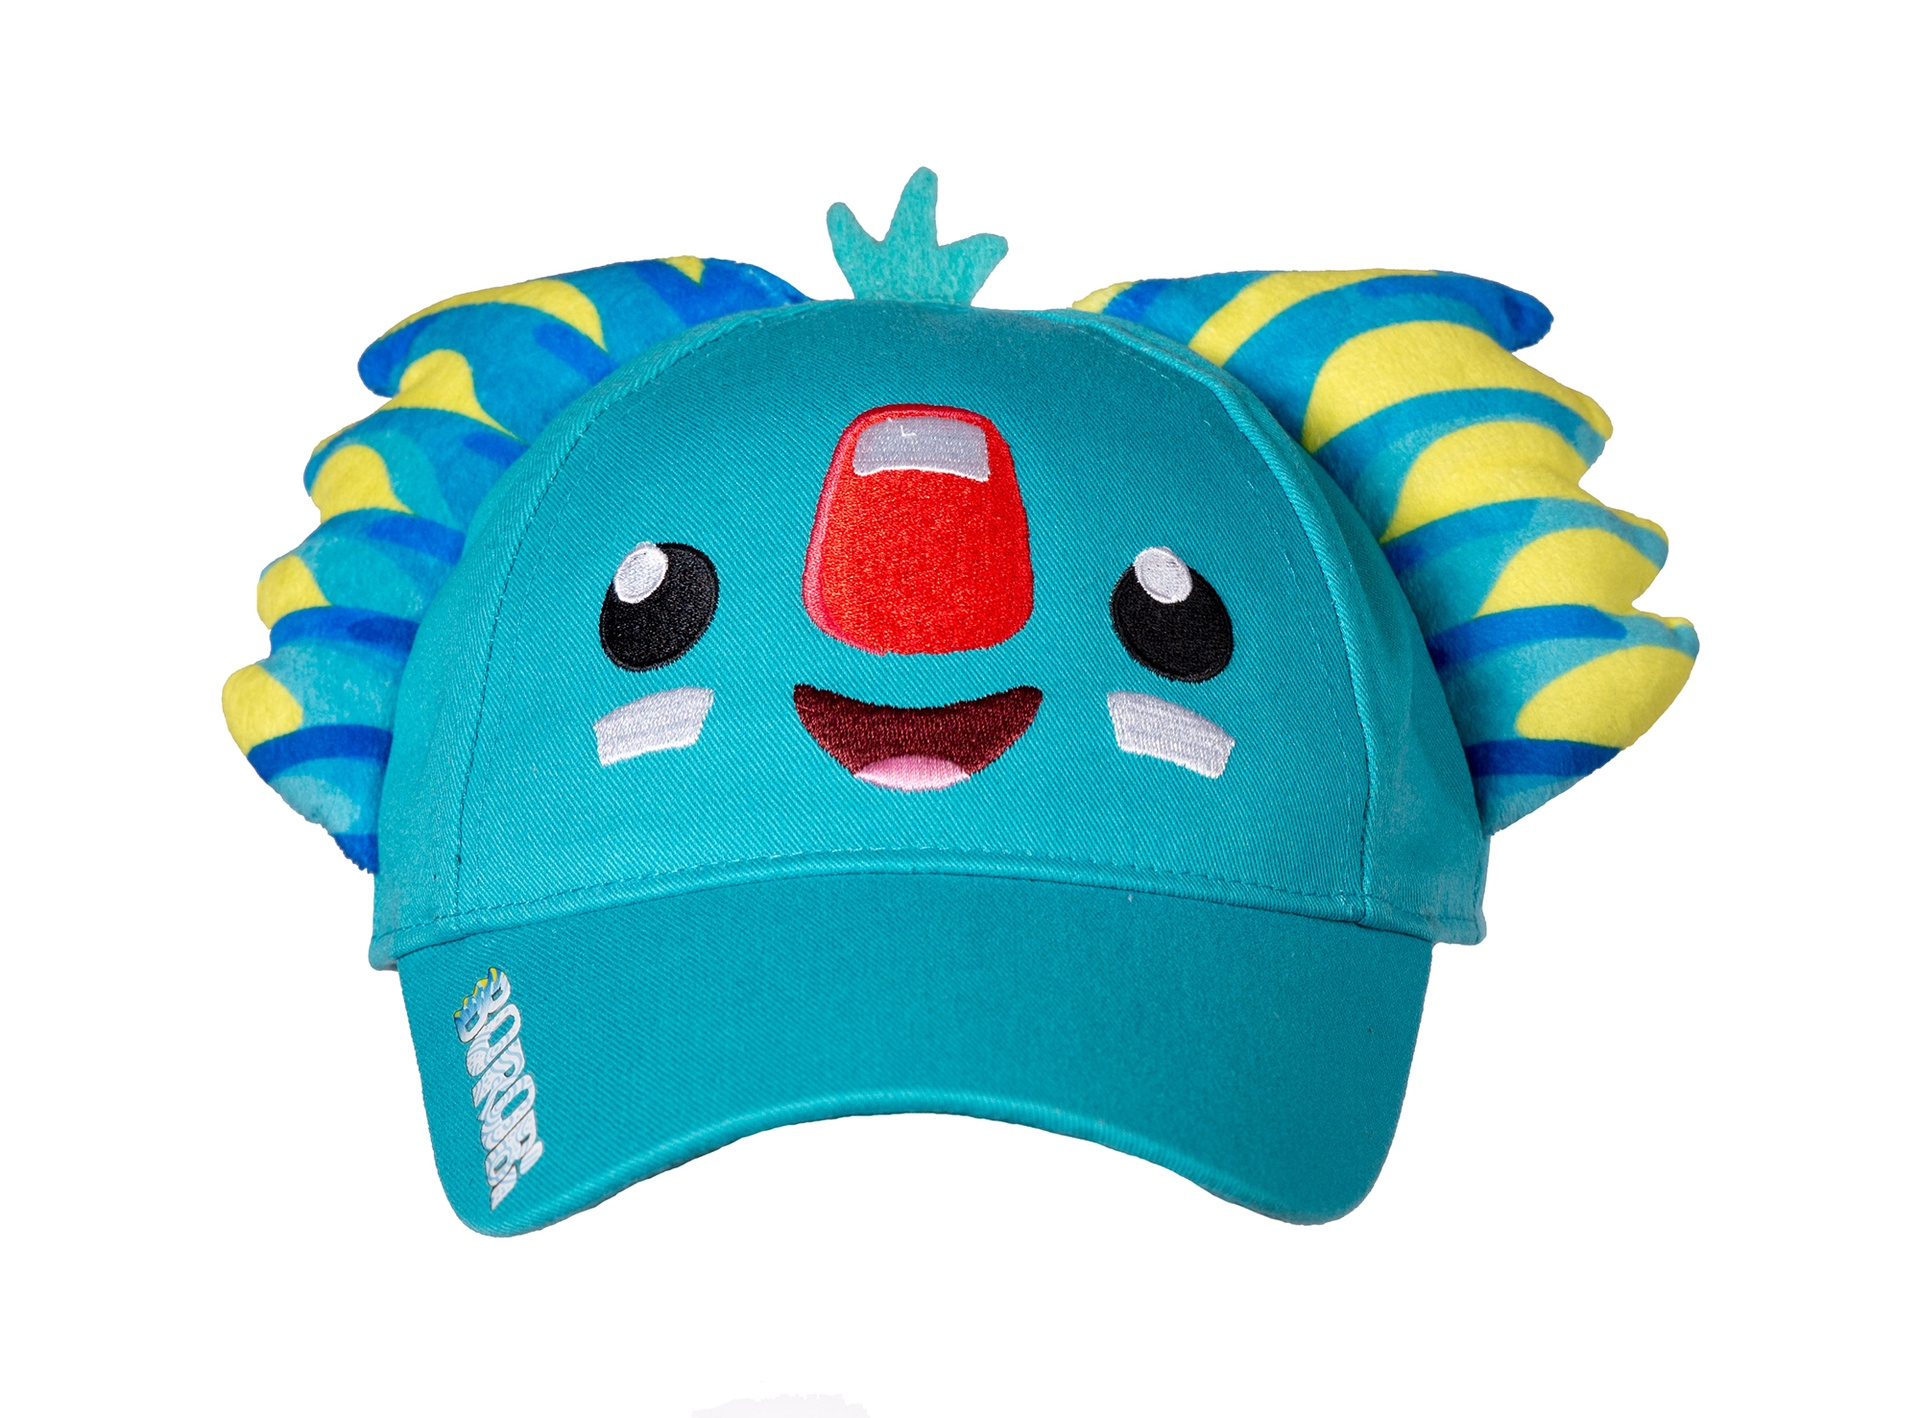 Borobi Mascot Cap Image